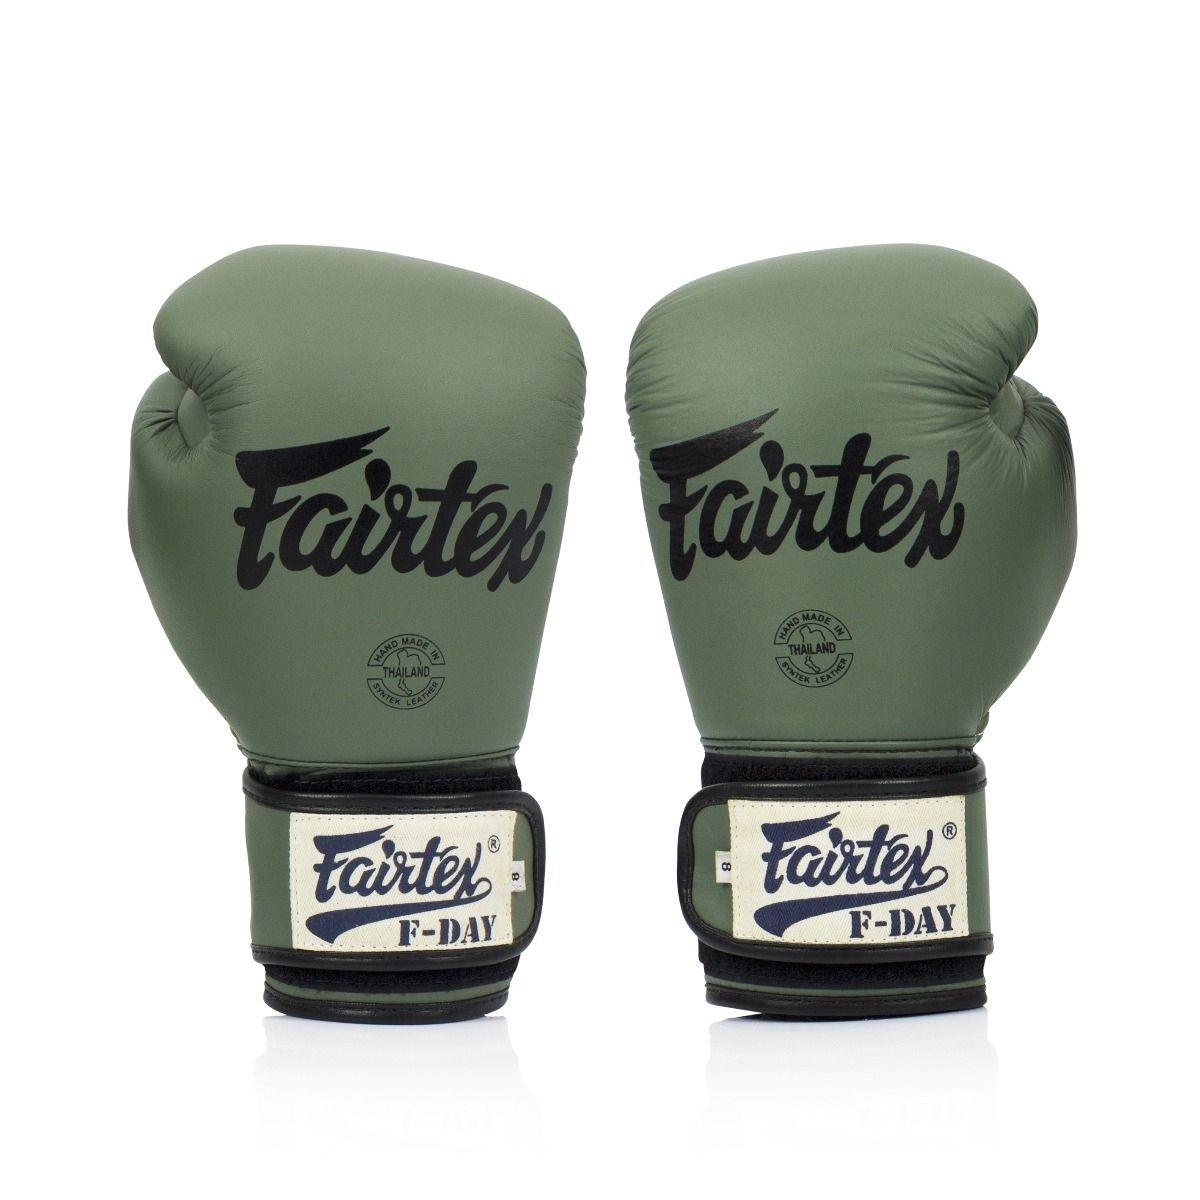 Fairtex F-Day Limited Edition Gloves, Muay Thai Glove